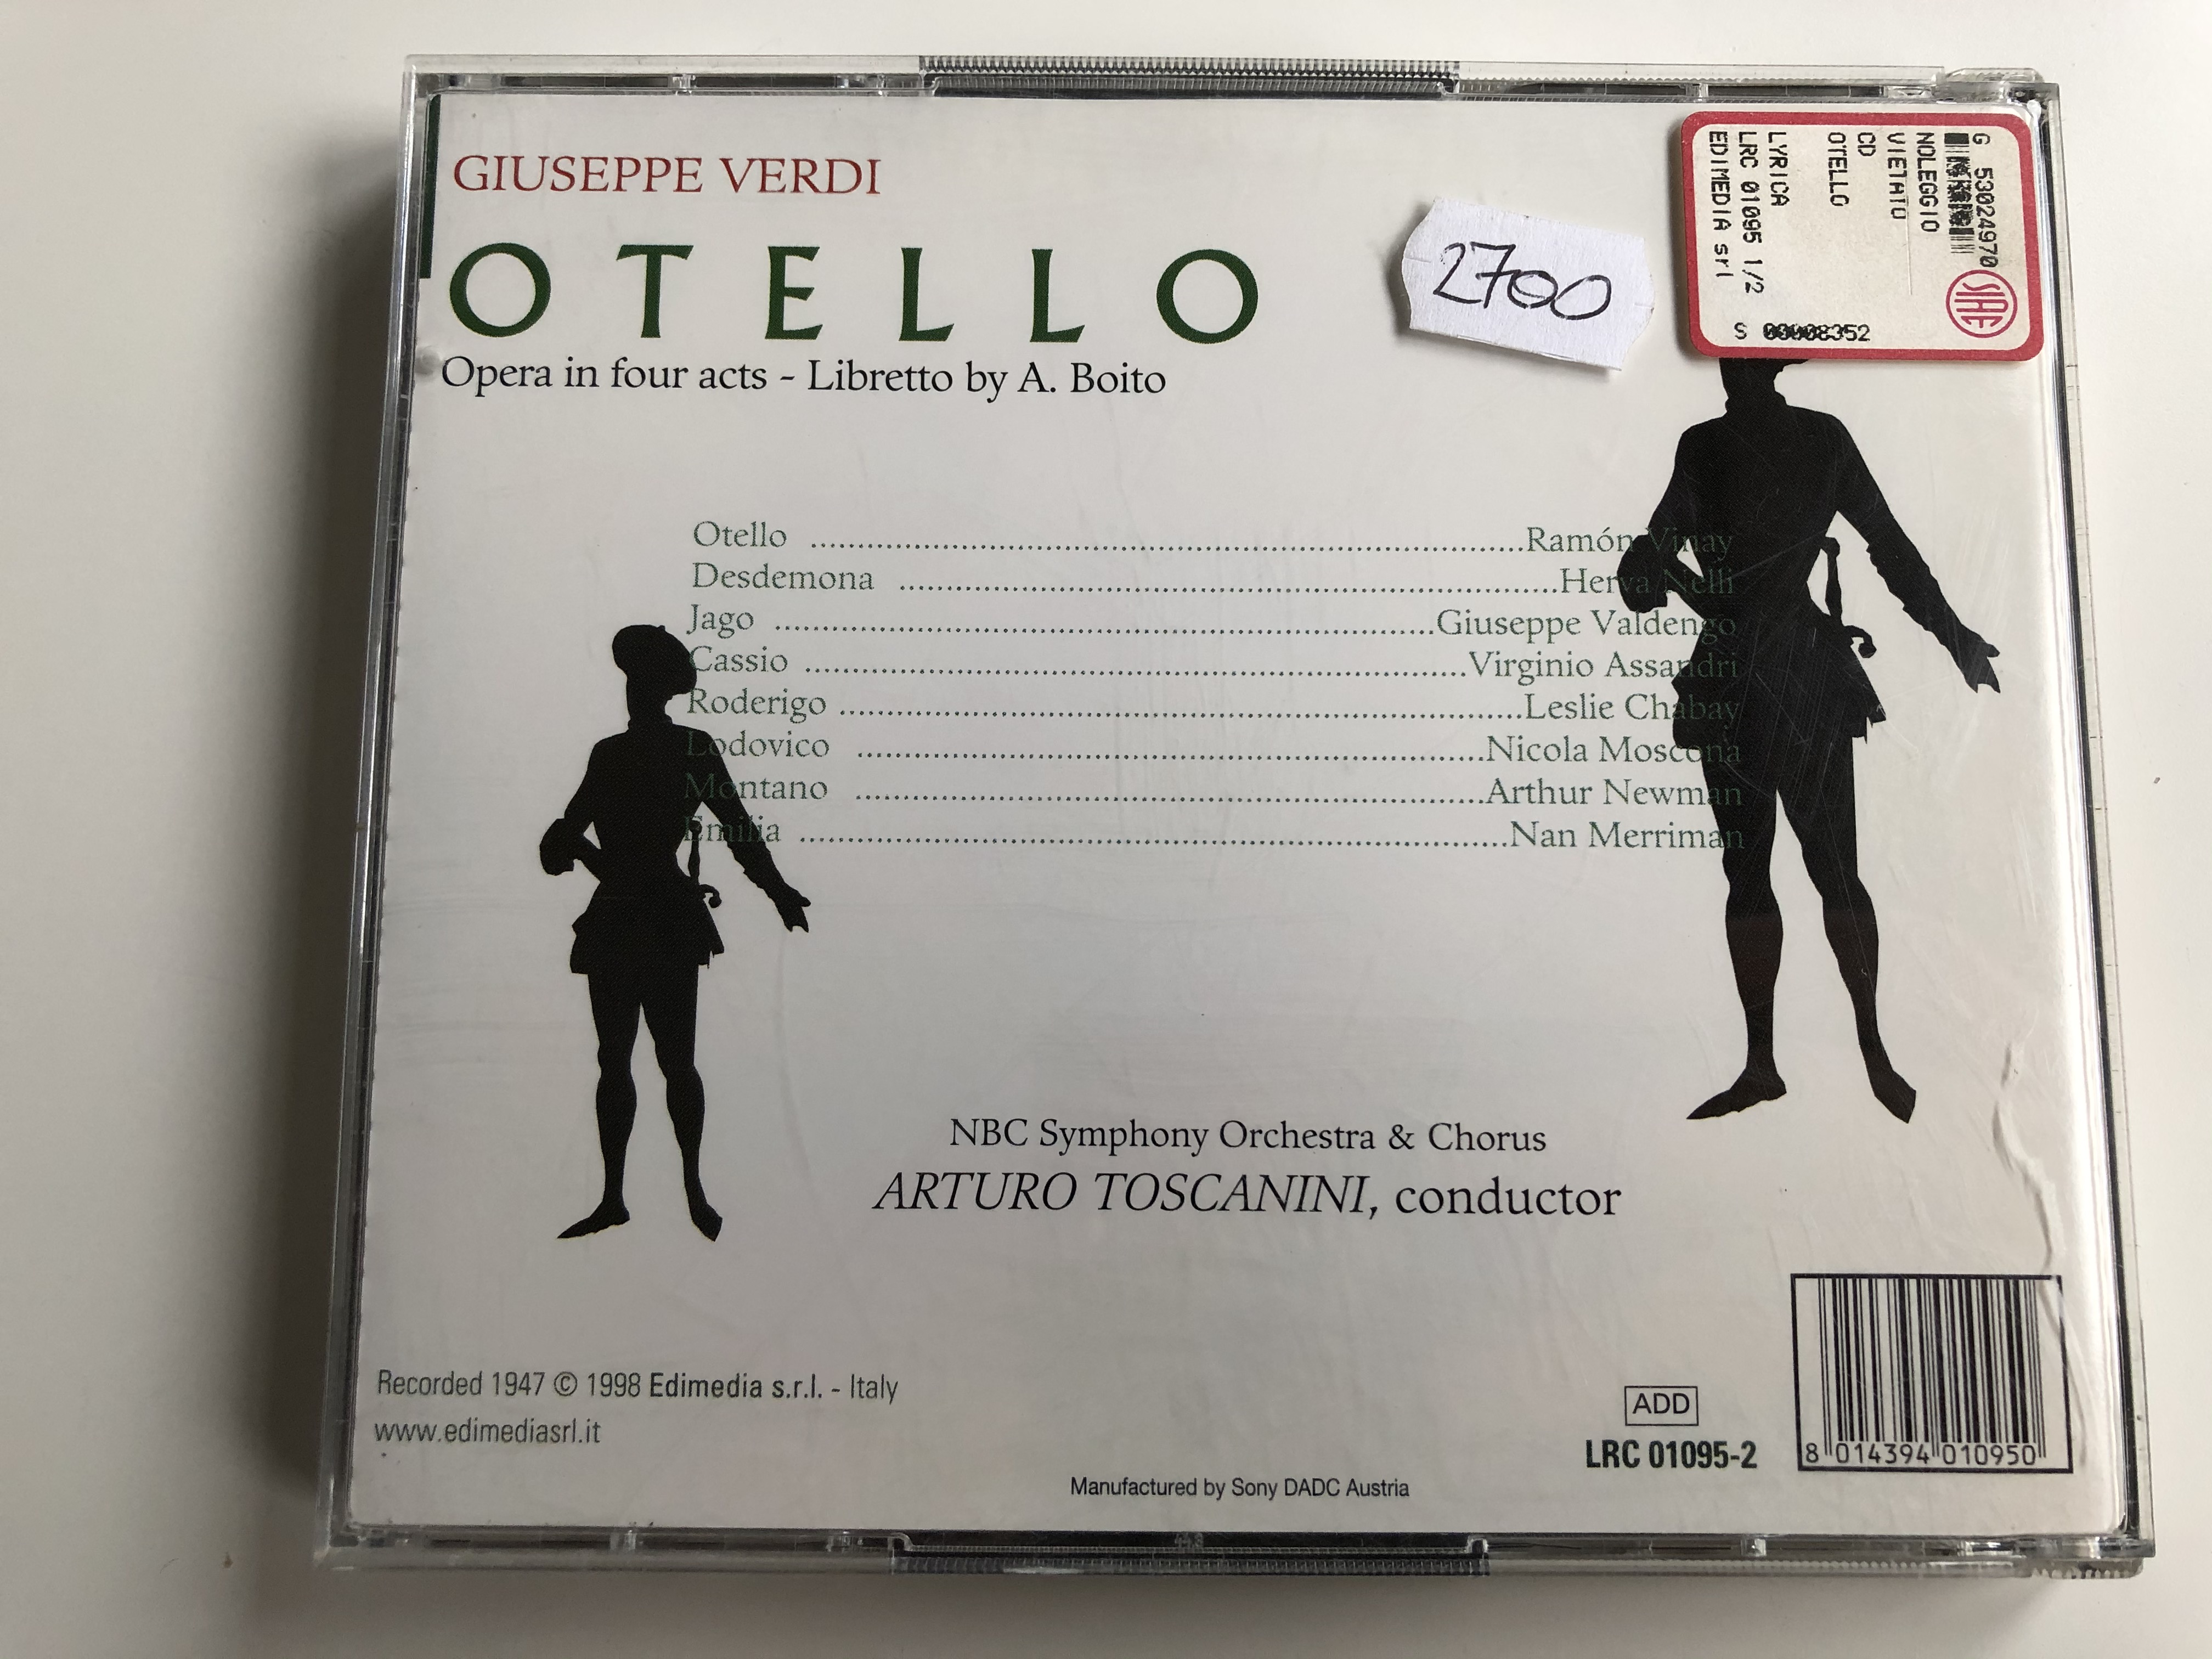 giuseppe-verdi-otello-vinay-nelli-valdengo-assandri-chabay-moscona-nbc-symphony-orchestra-chorus-arturo-toscanini-lyrica-2x-audio-cd-1998-lrc-01095-2-5-.jpg